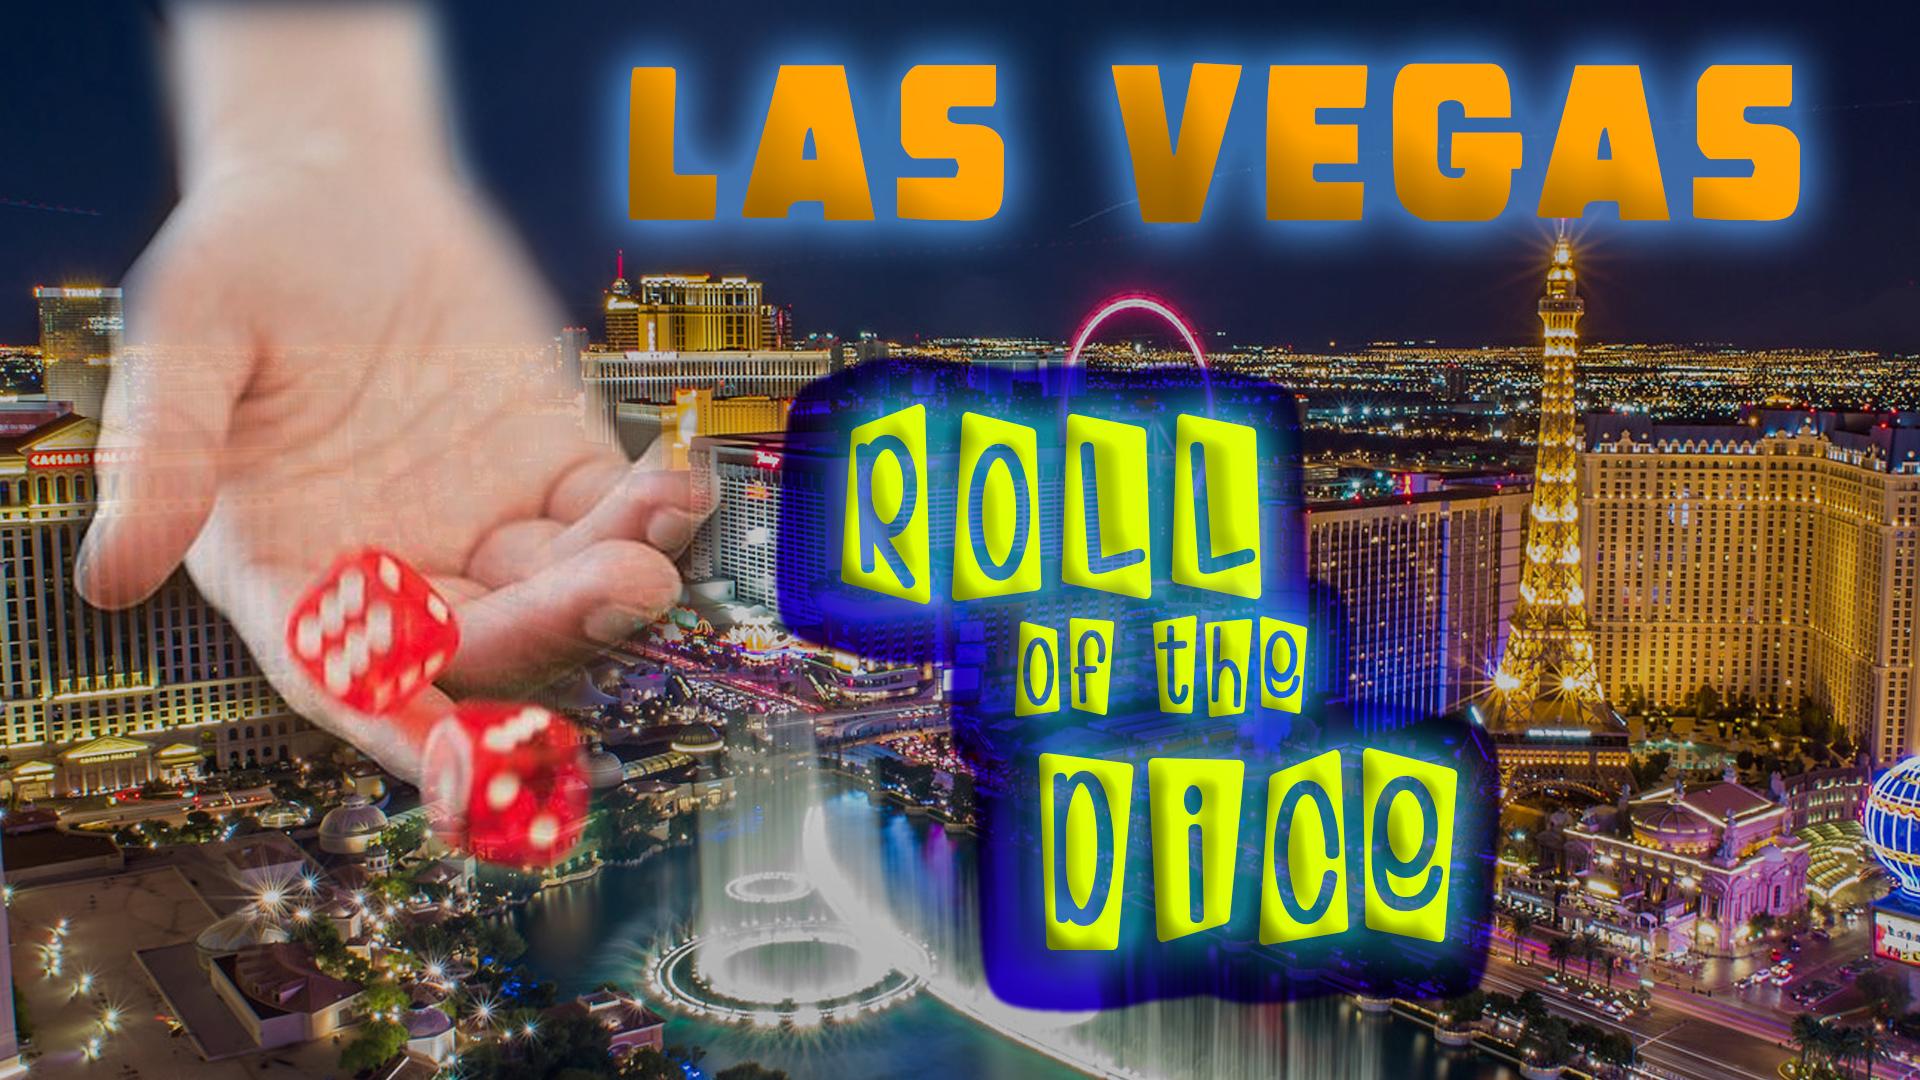 Las Vegas:  Roll of the Dice